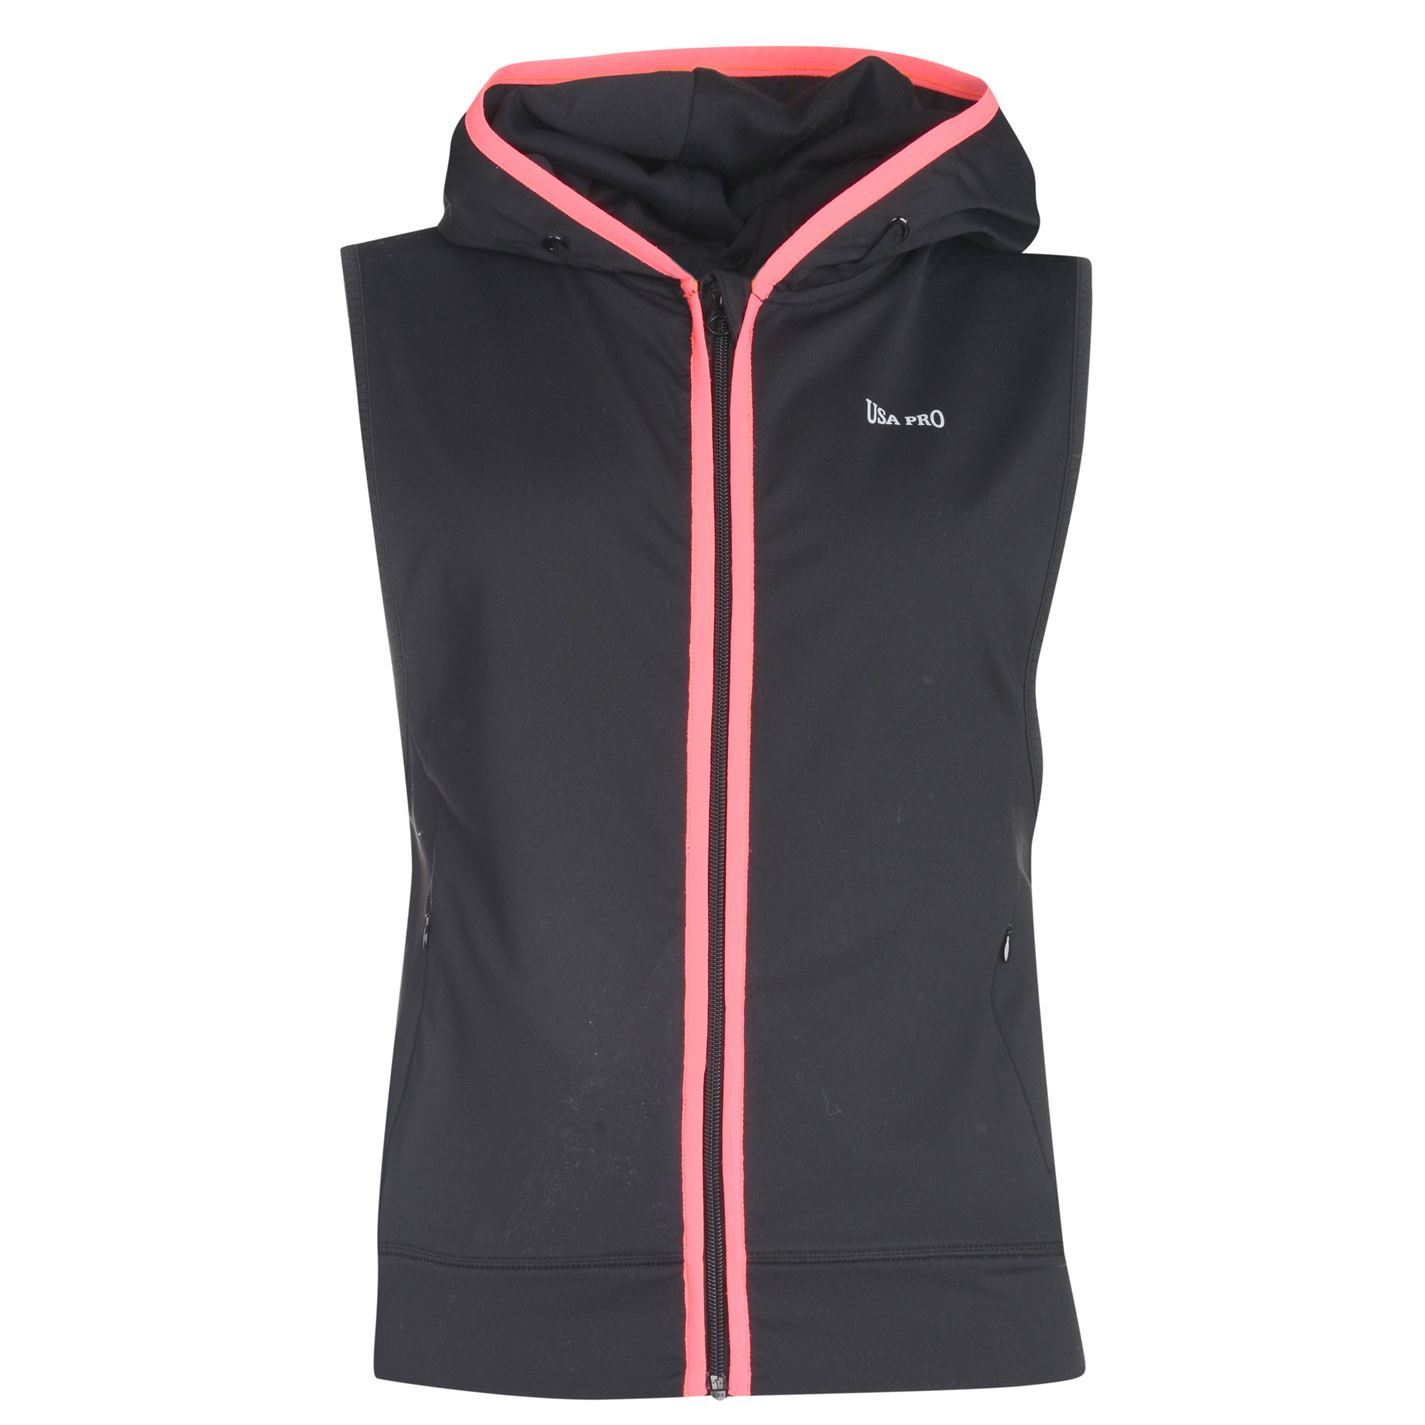 Sleeveless hoodie for women